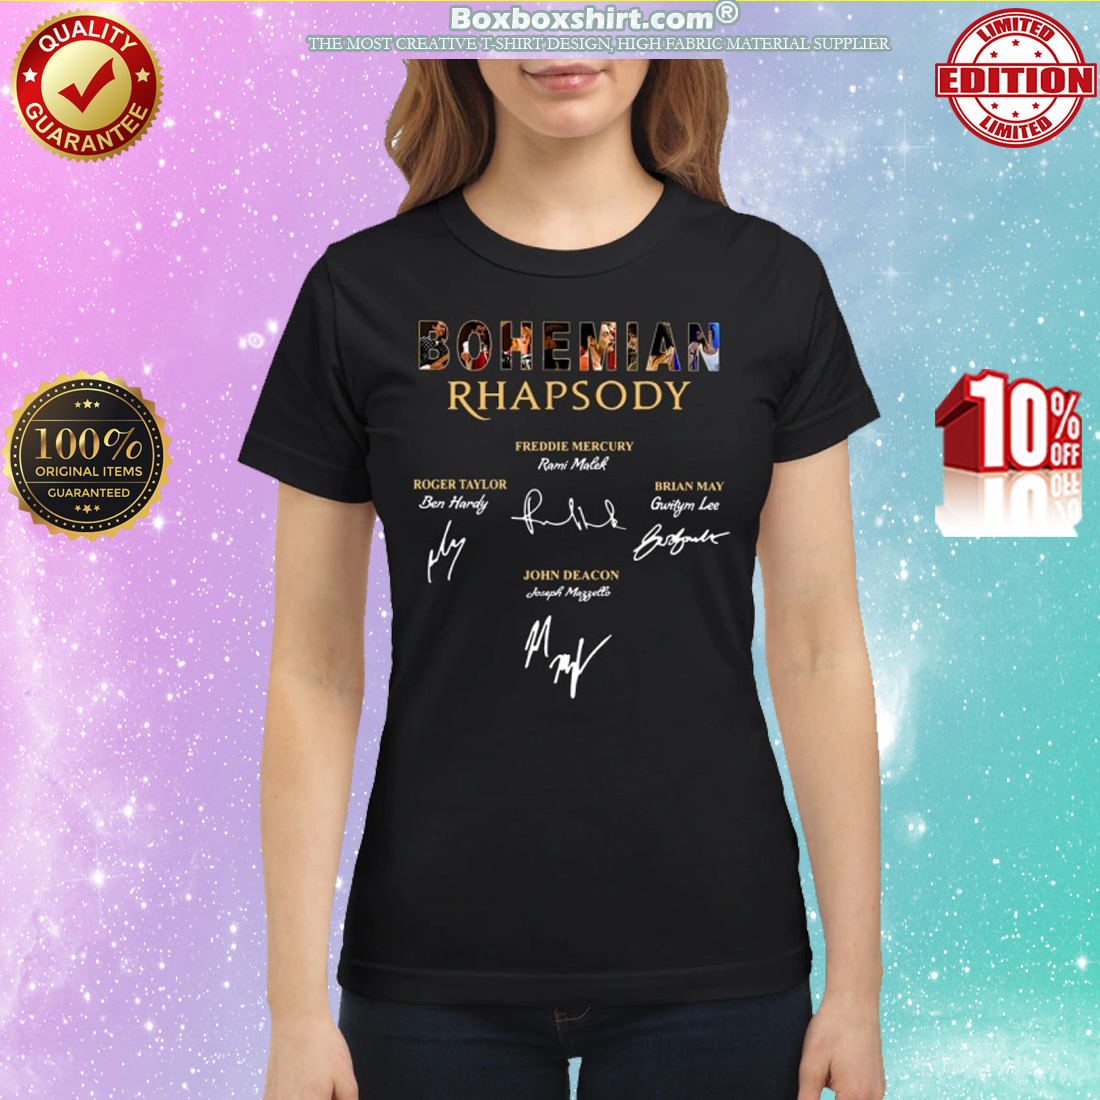 Bohemian Rhapsody Freddie Mercury Signatures classic shirt